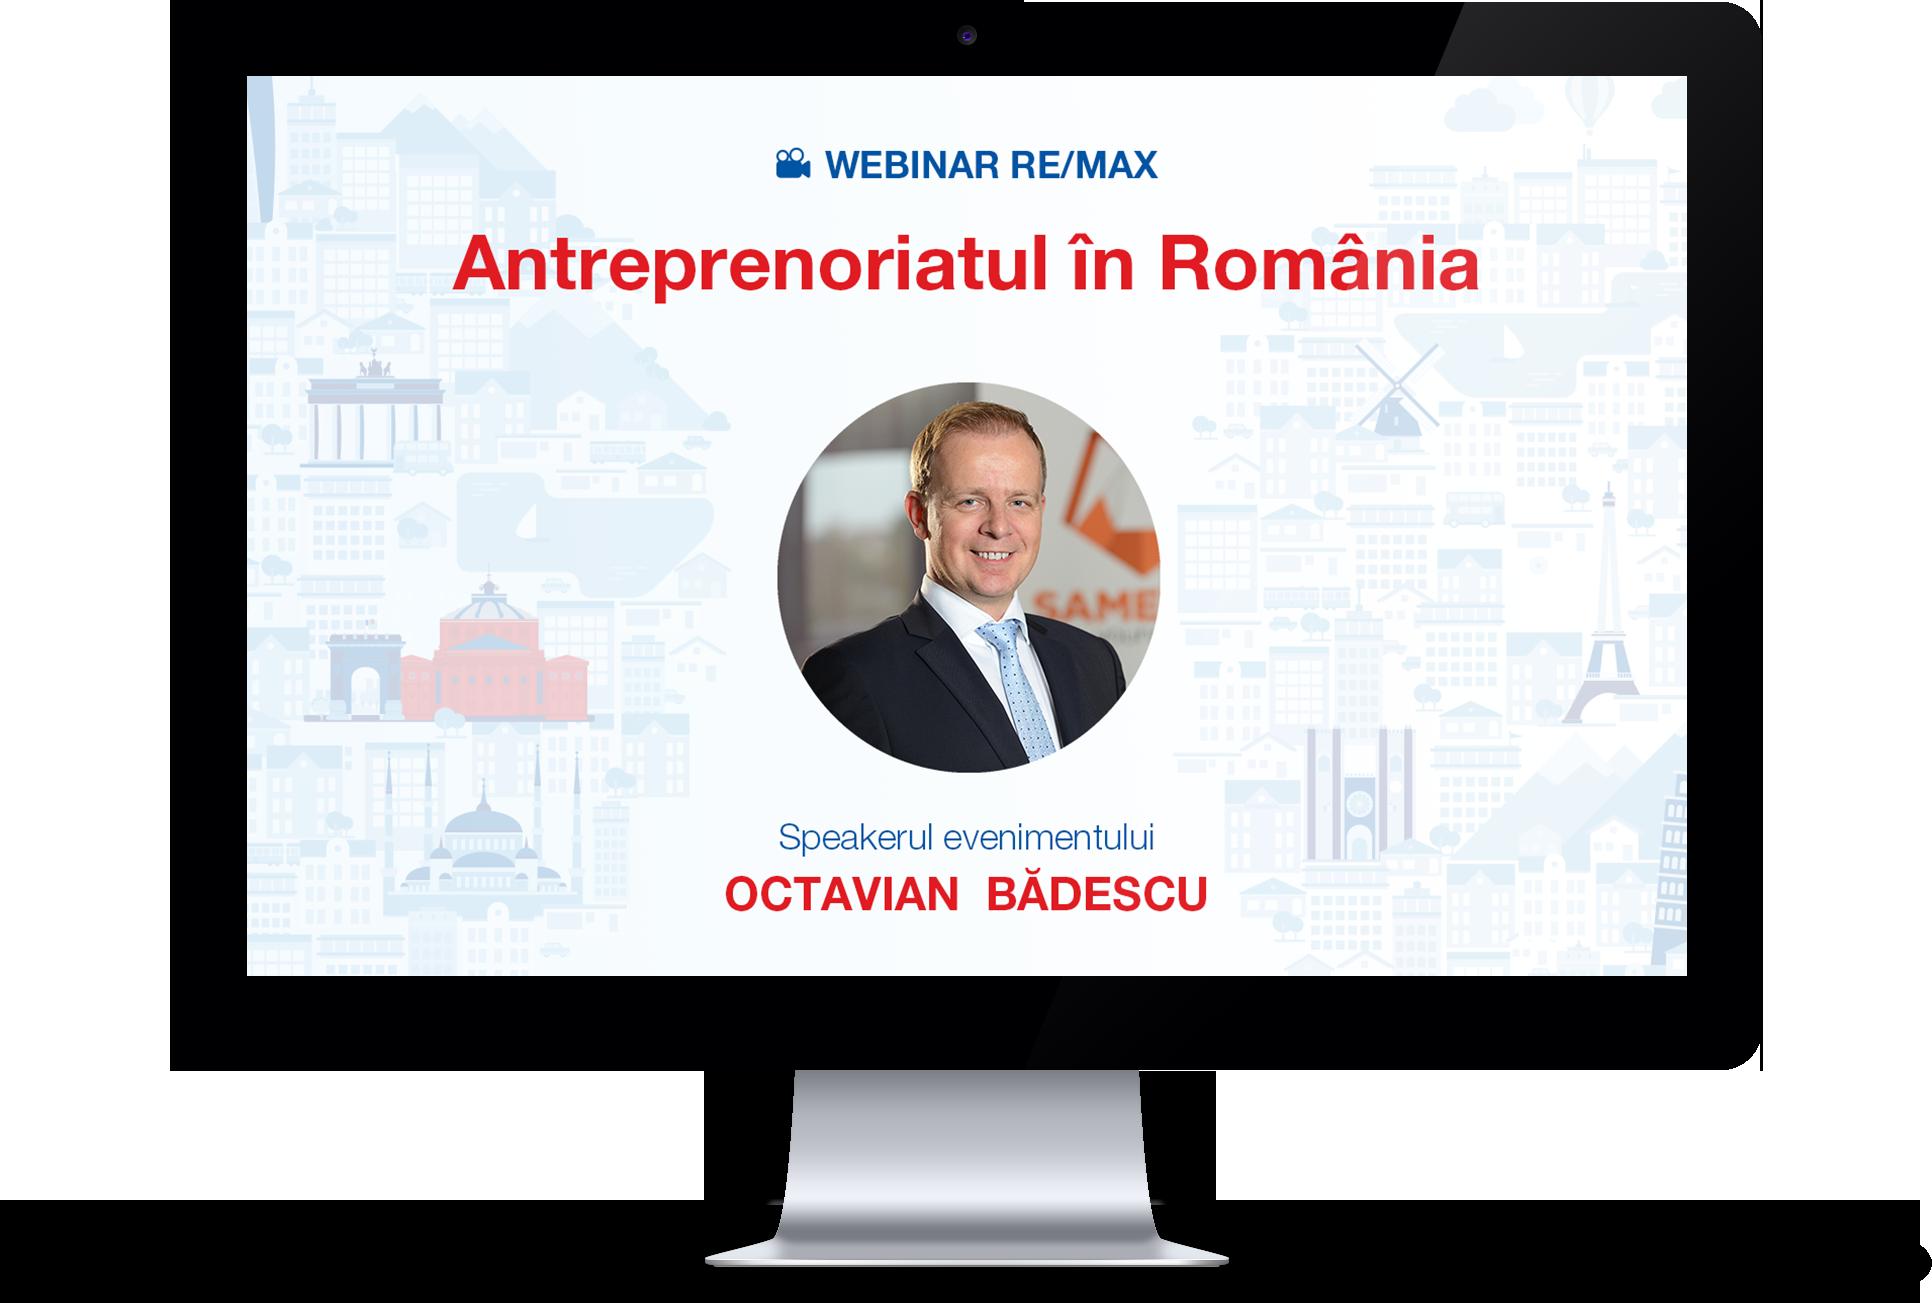 webinar-octavian-badescu.png